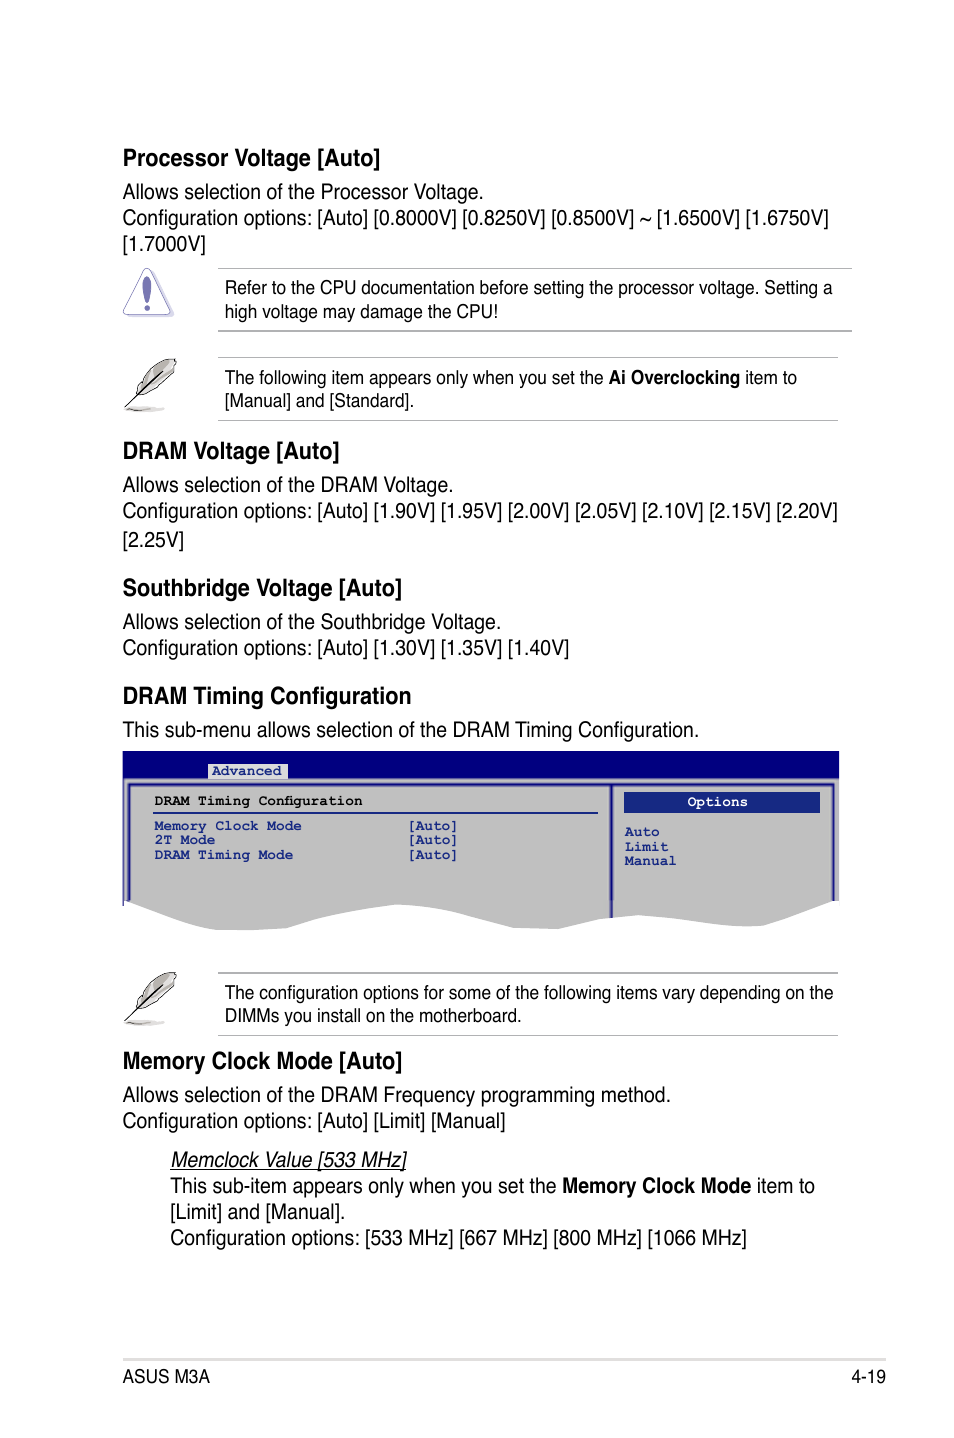 Dram voltage [auto, Southbridge voltage [auto, Dram timing configuration   Asus M3A User Manual   Page 79 / 134